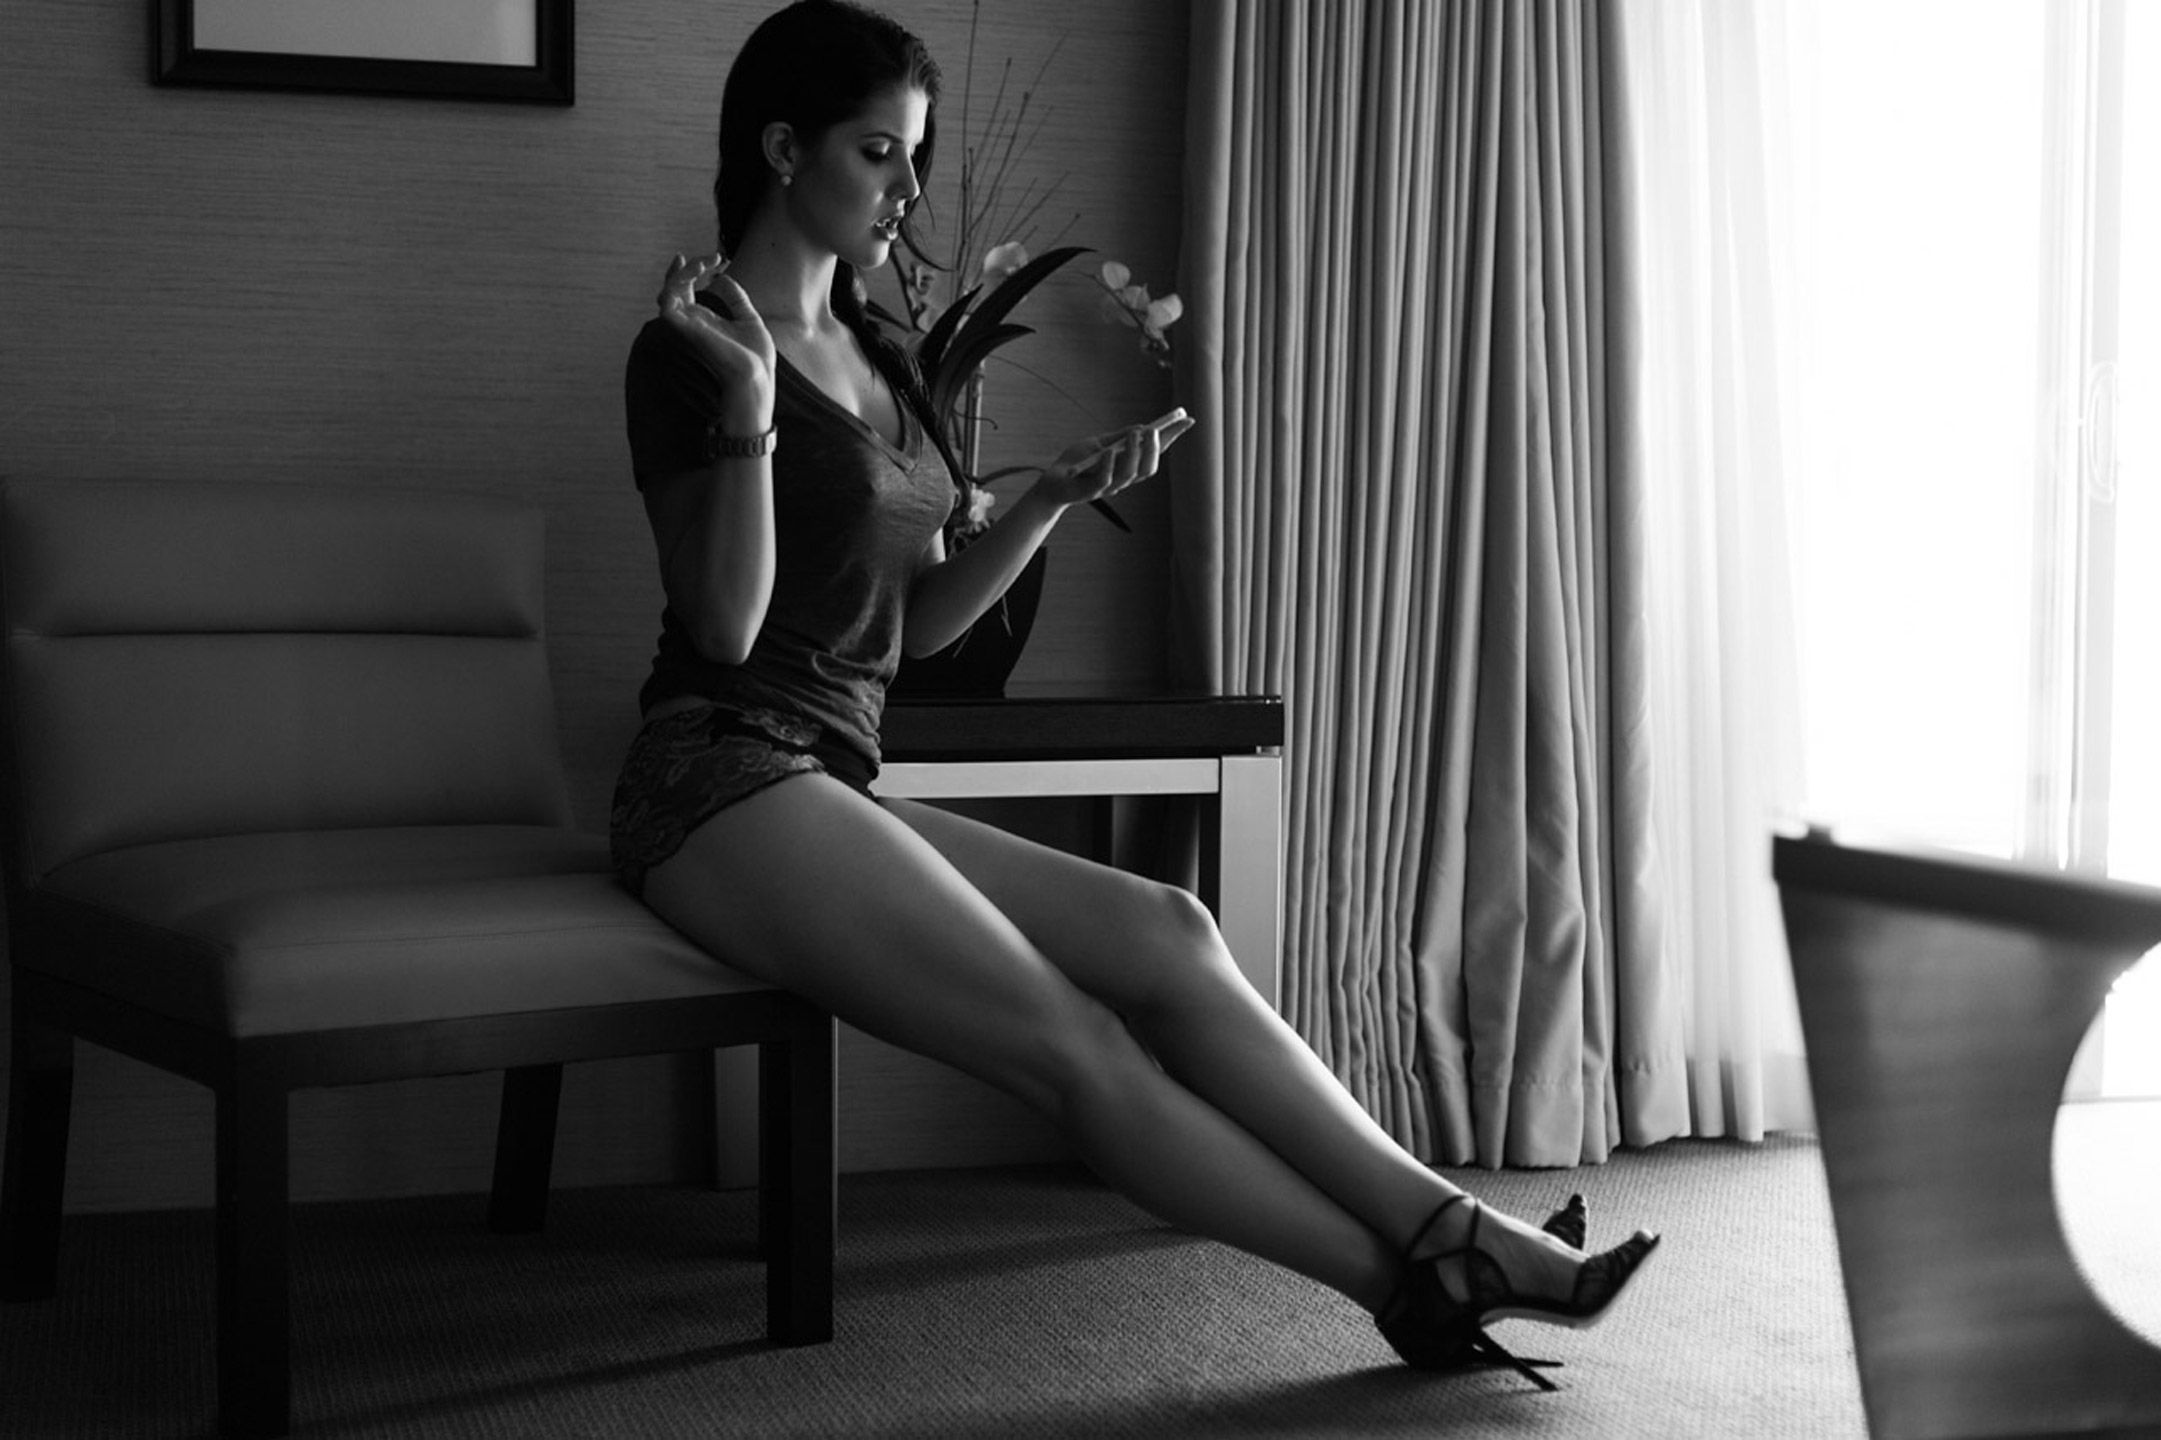 Amanda-Cerny-Topless-10